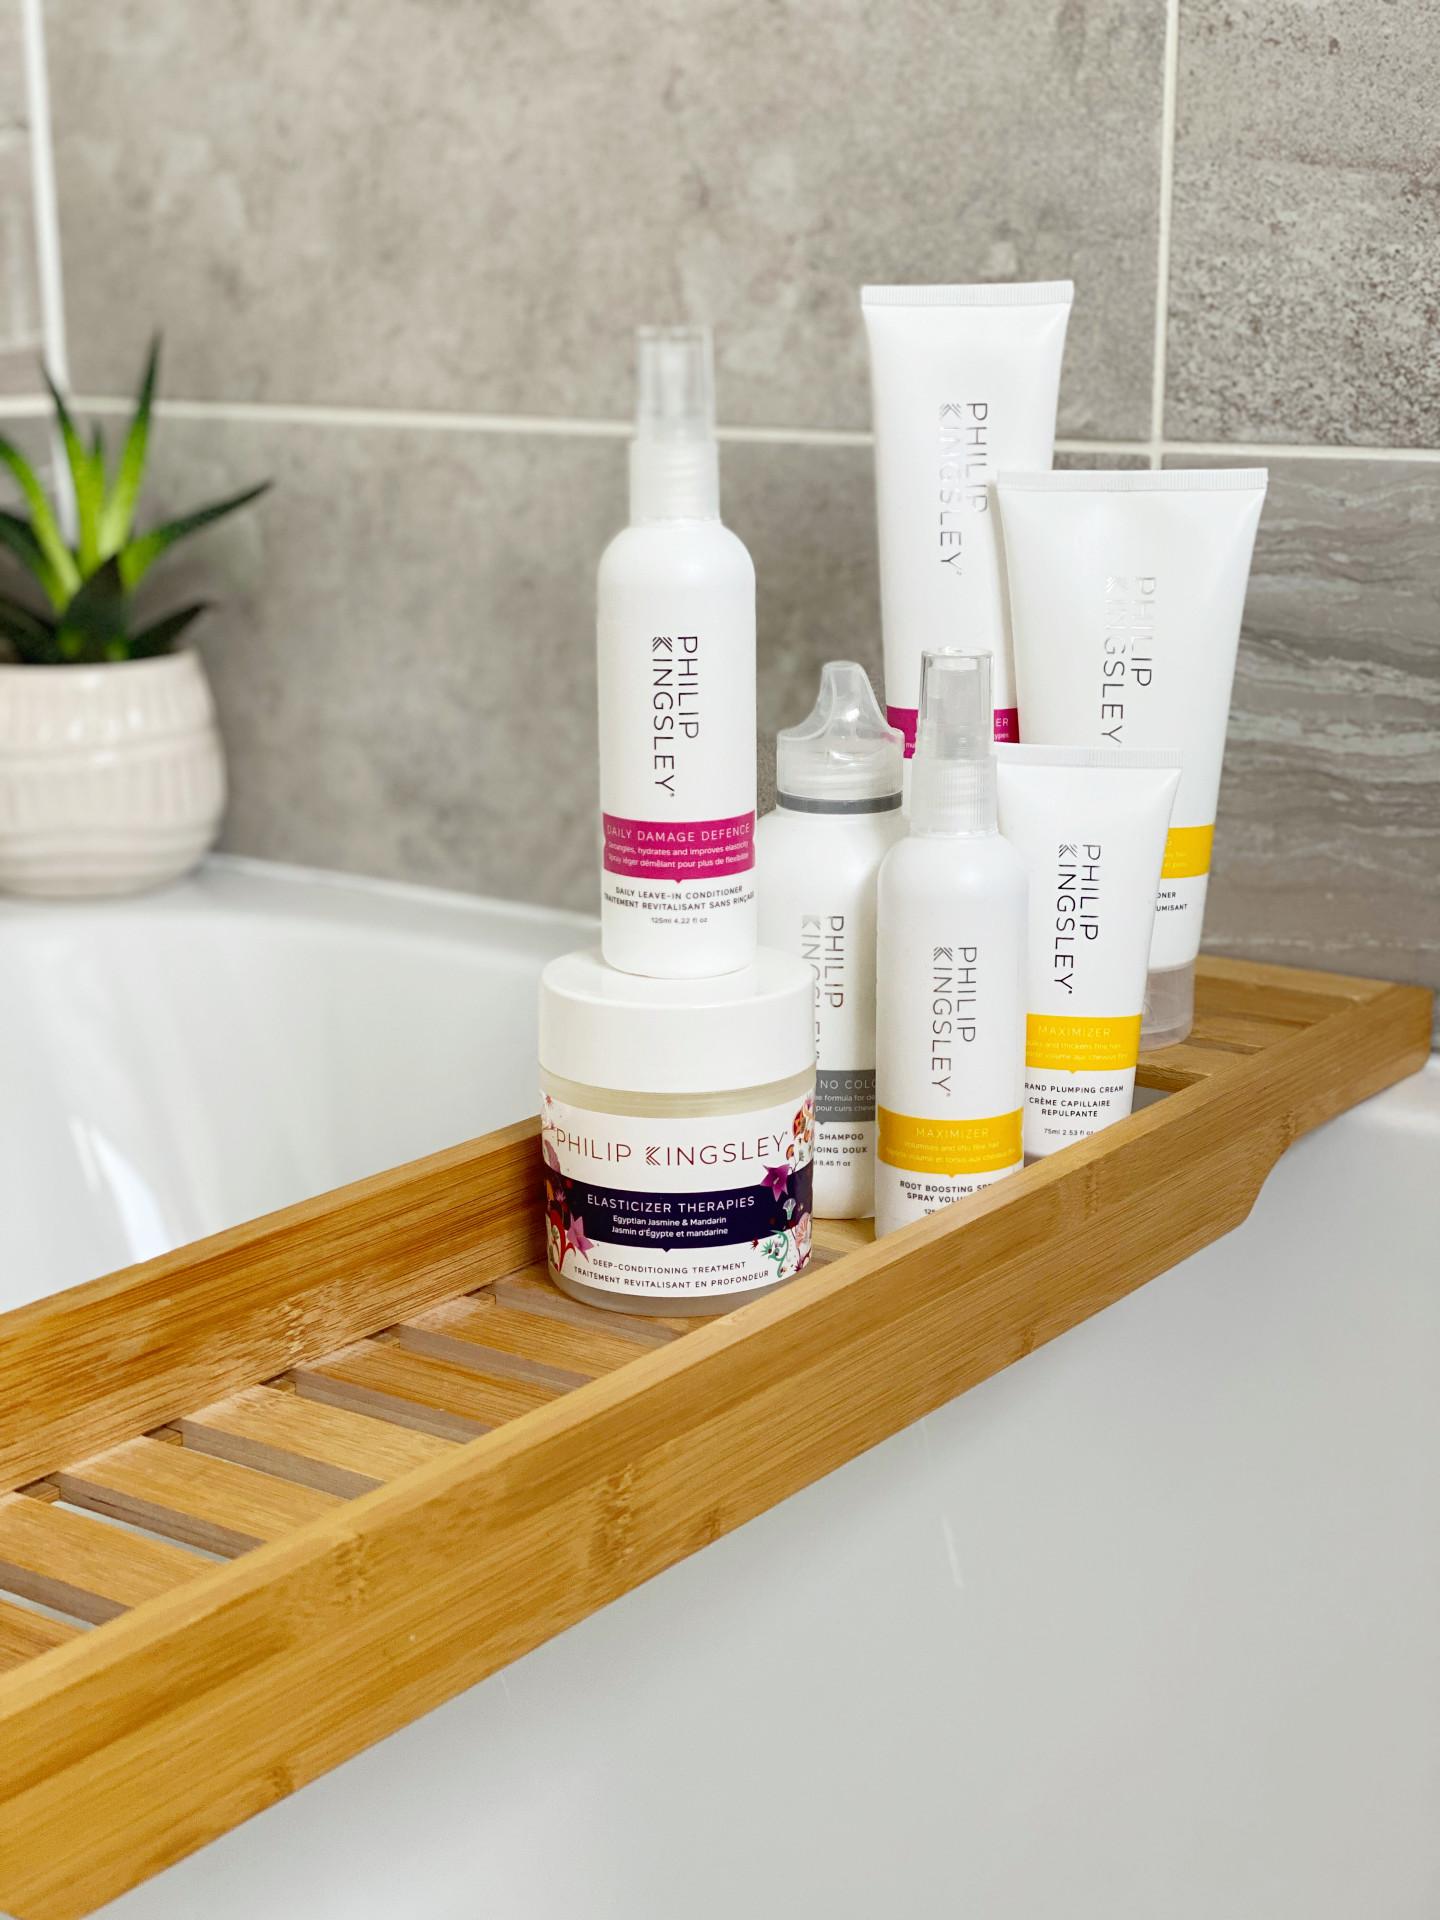 philip kingsley hair care review